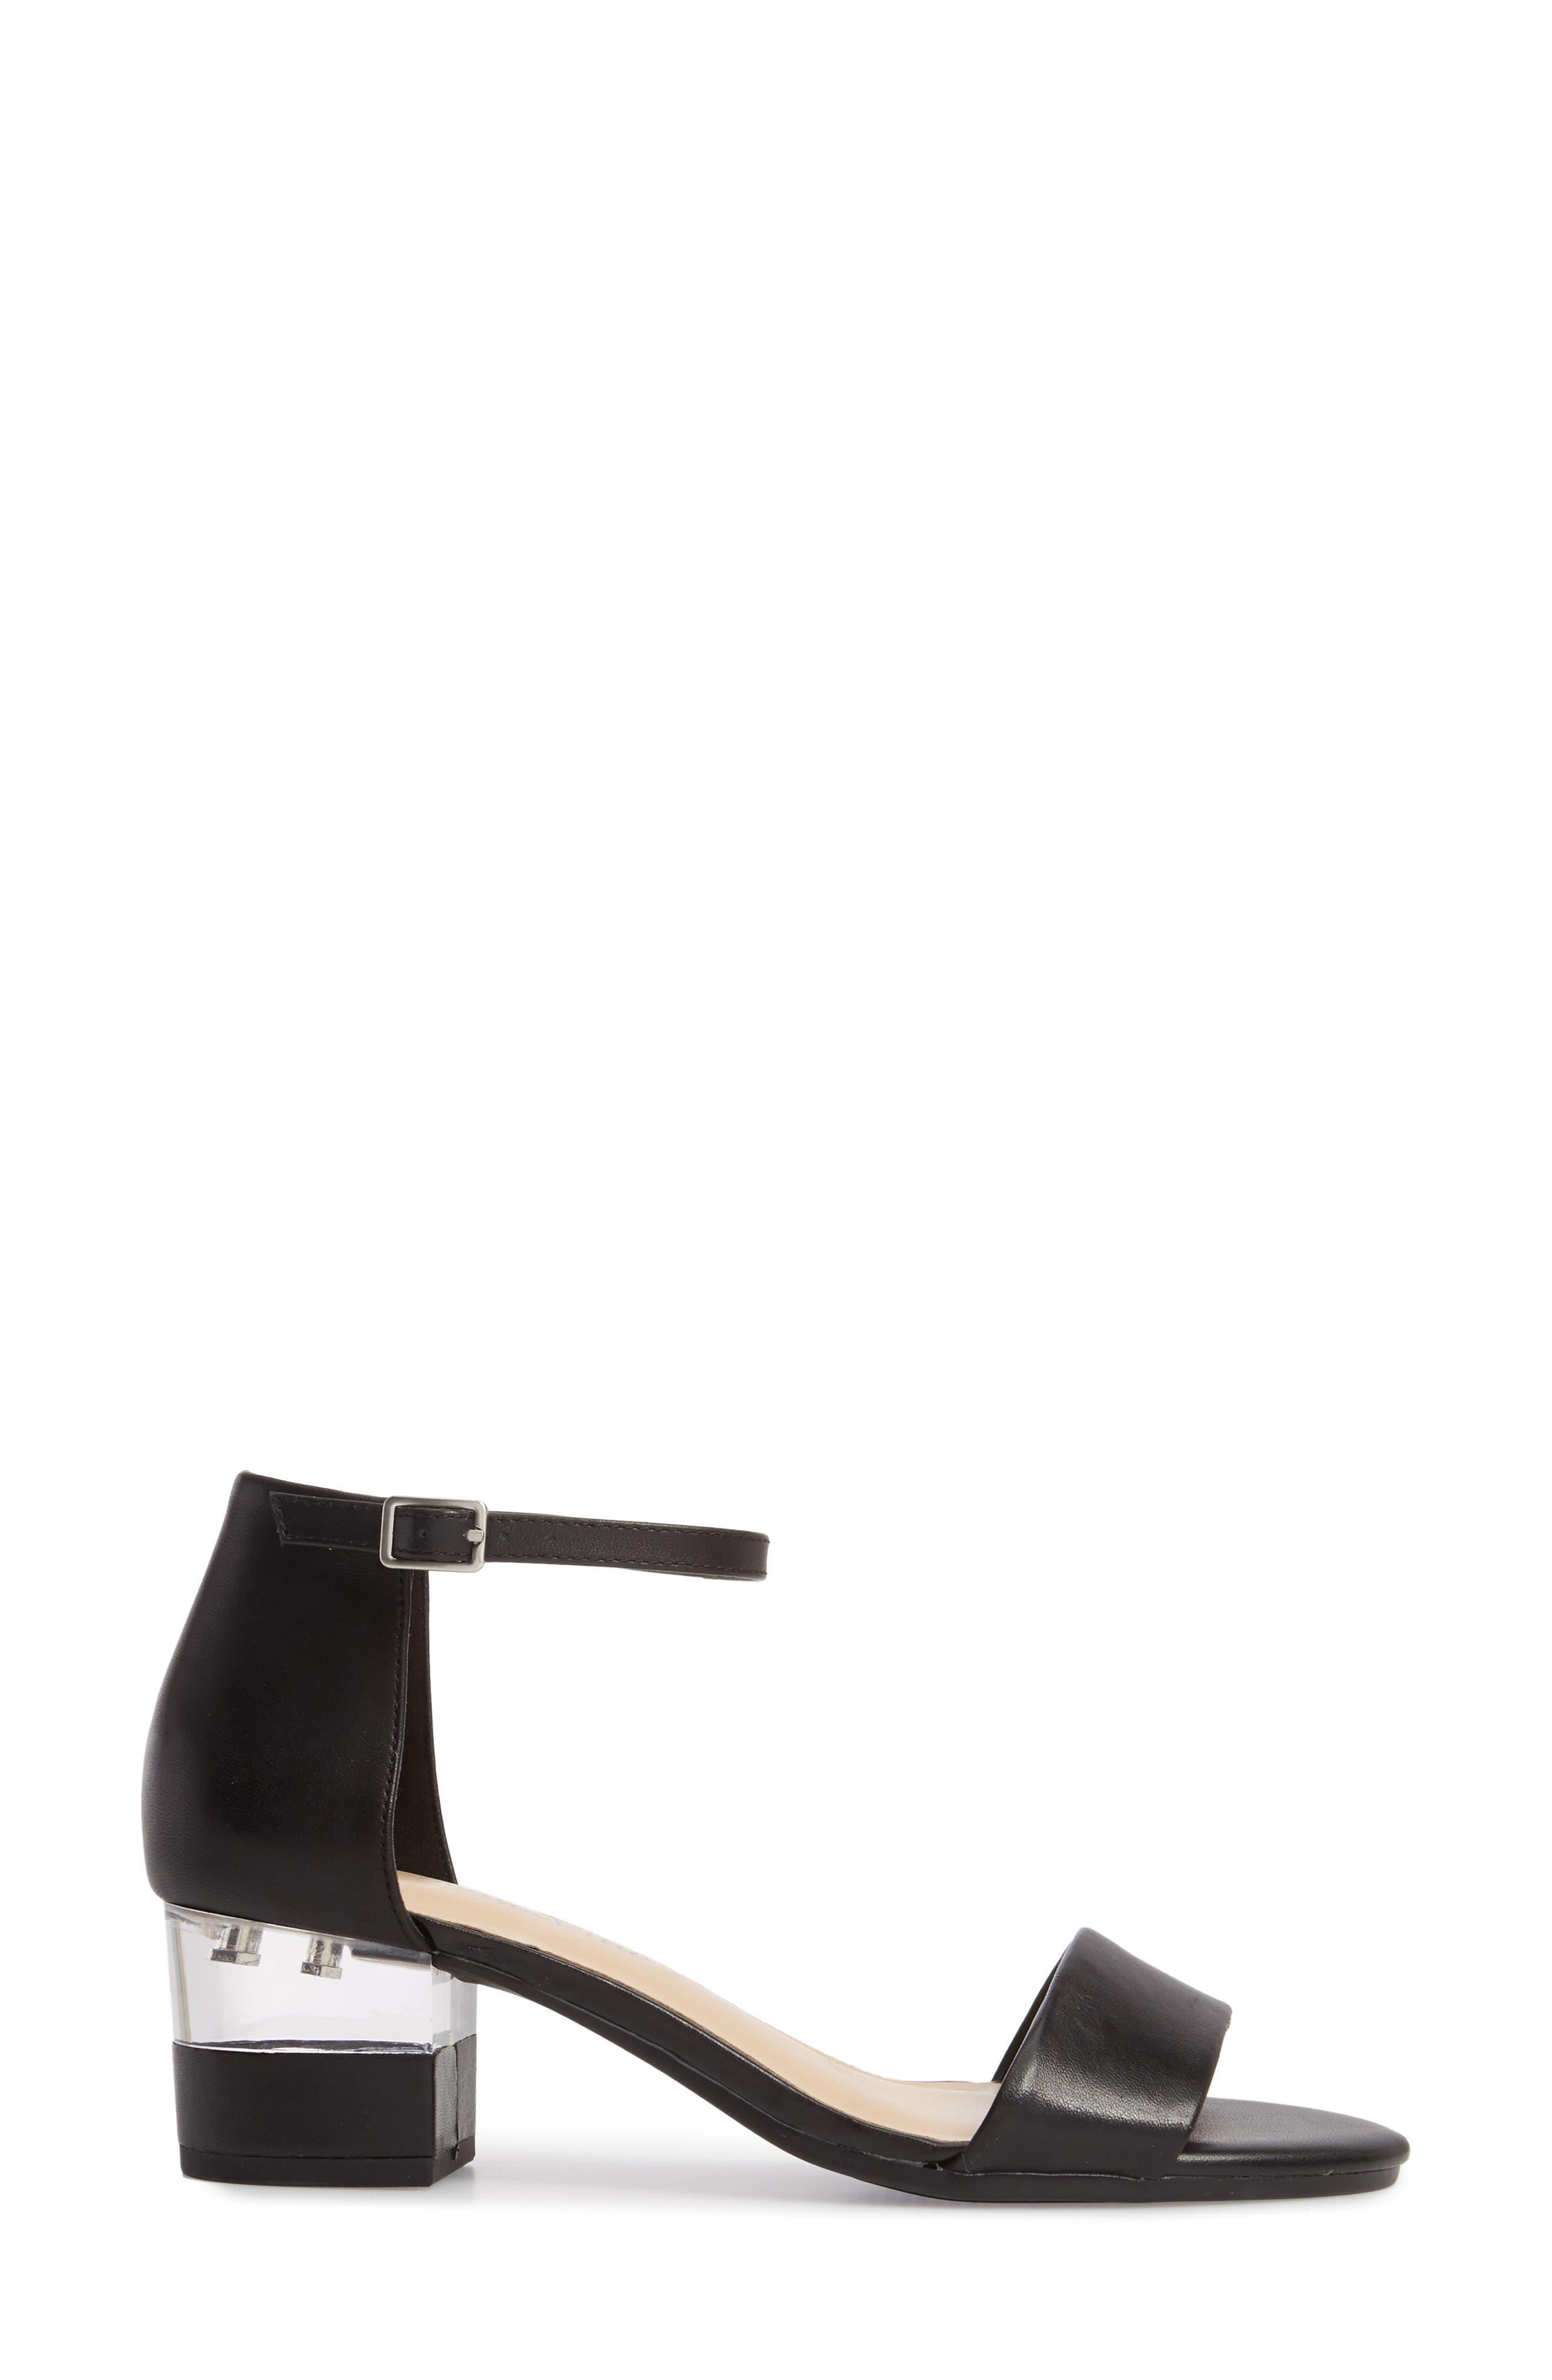 Fitz Block Heel Sandal,                             Alternate thumbnail 3, color,                             BLACK LEATHER